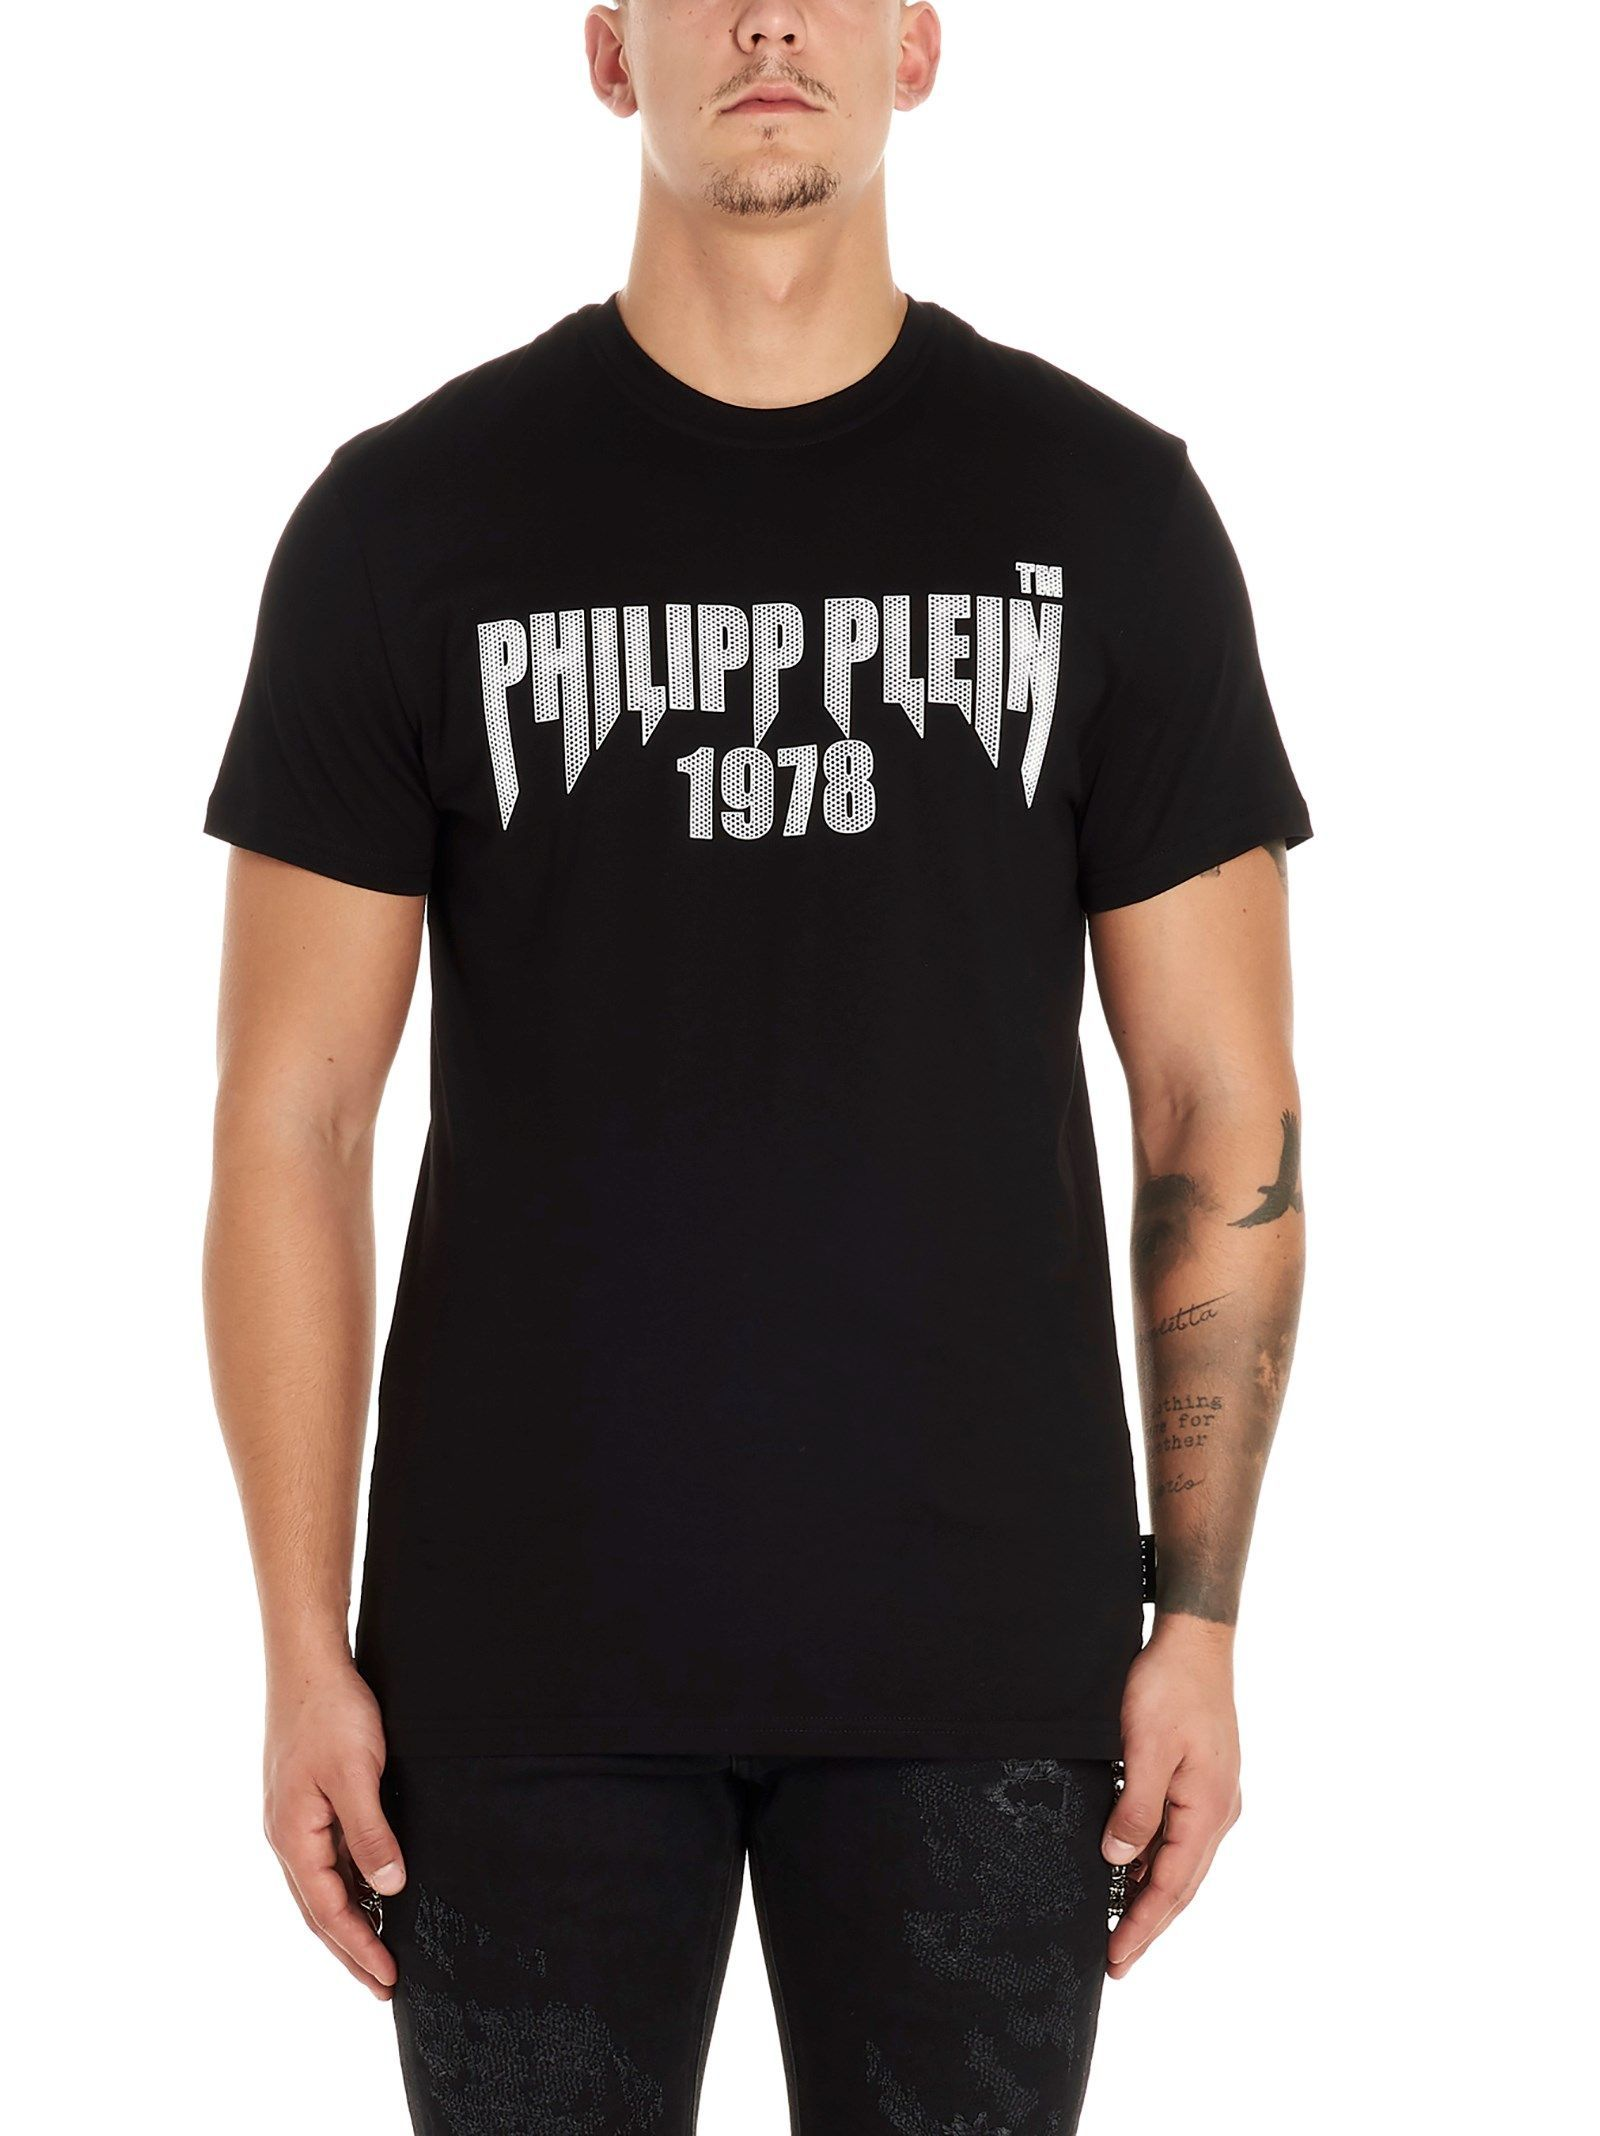 PHILIPP PLEIN MEN'S MTK4260PJY002N0201 BLACK COTTON T-SHIRT